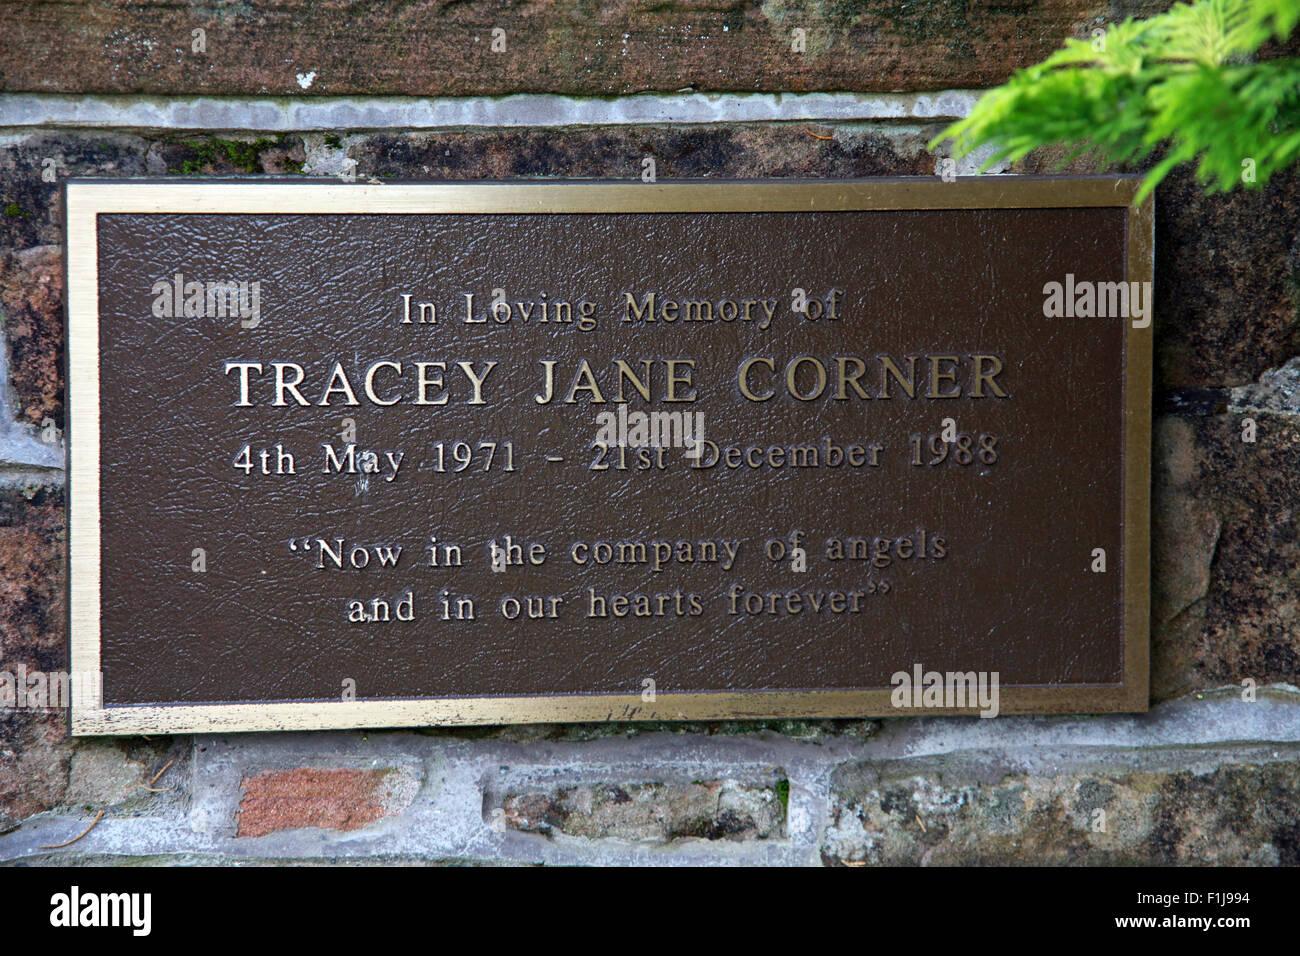 Lockerbie PanAm103 In Rememberance Memorial Tracey Jane Corner,Scotland Stock Photo